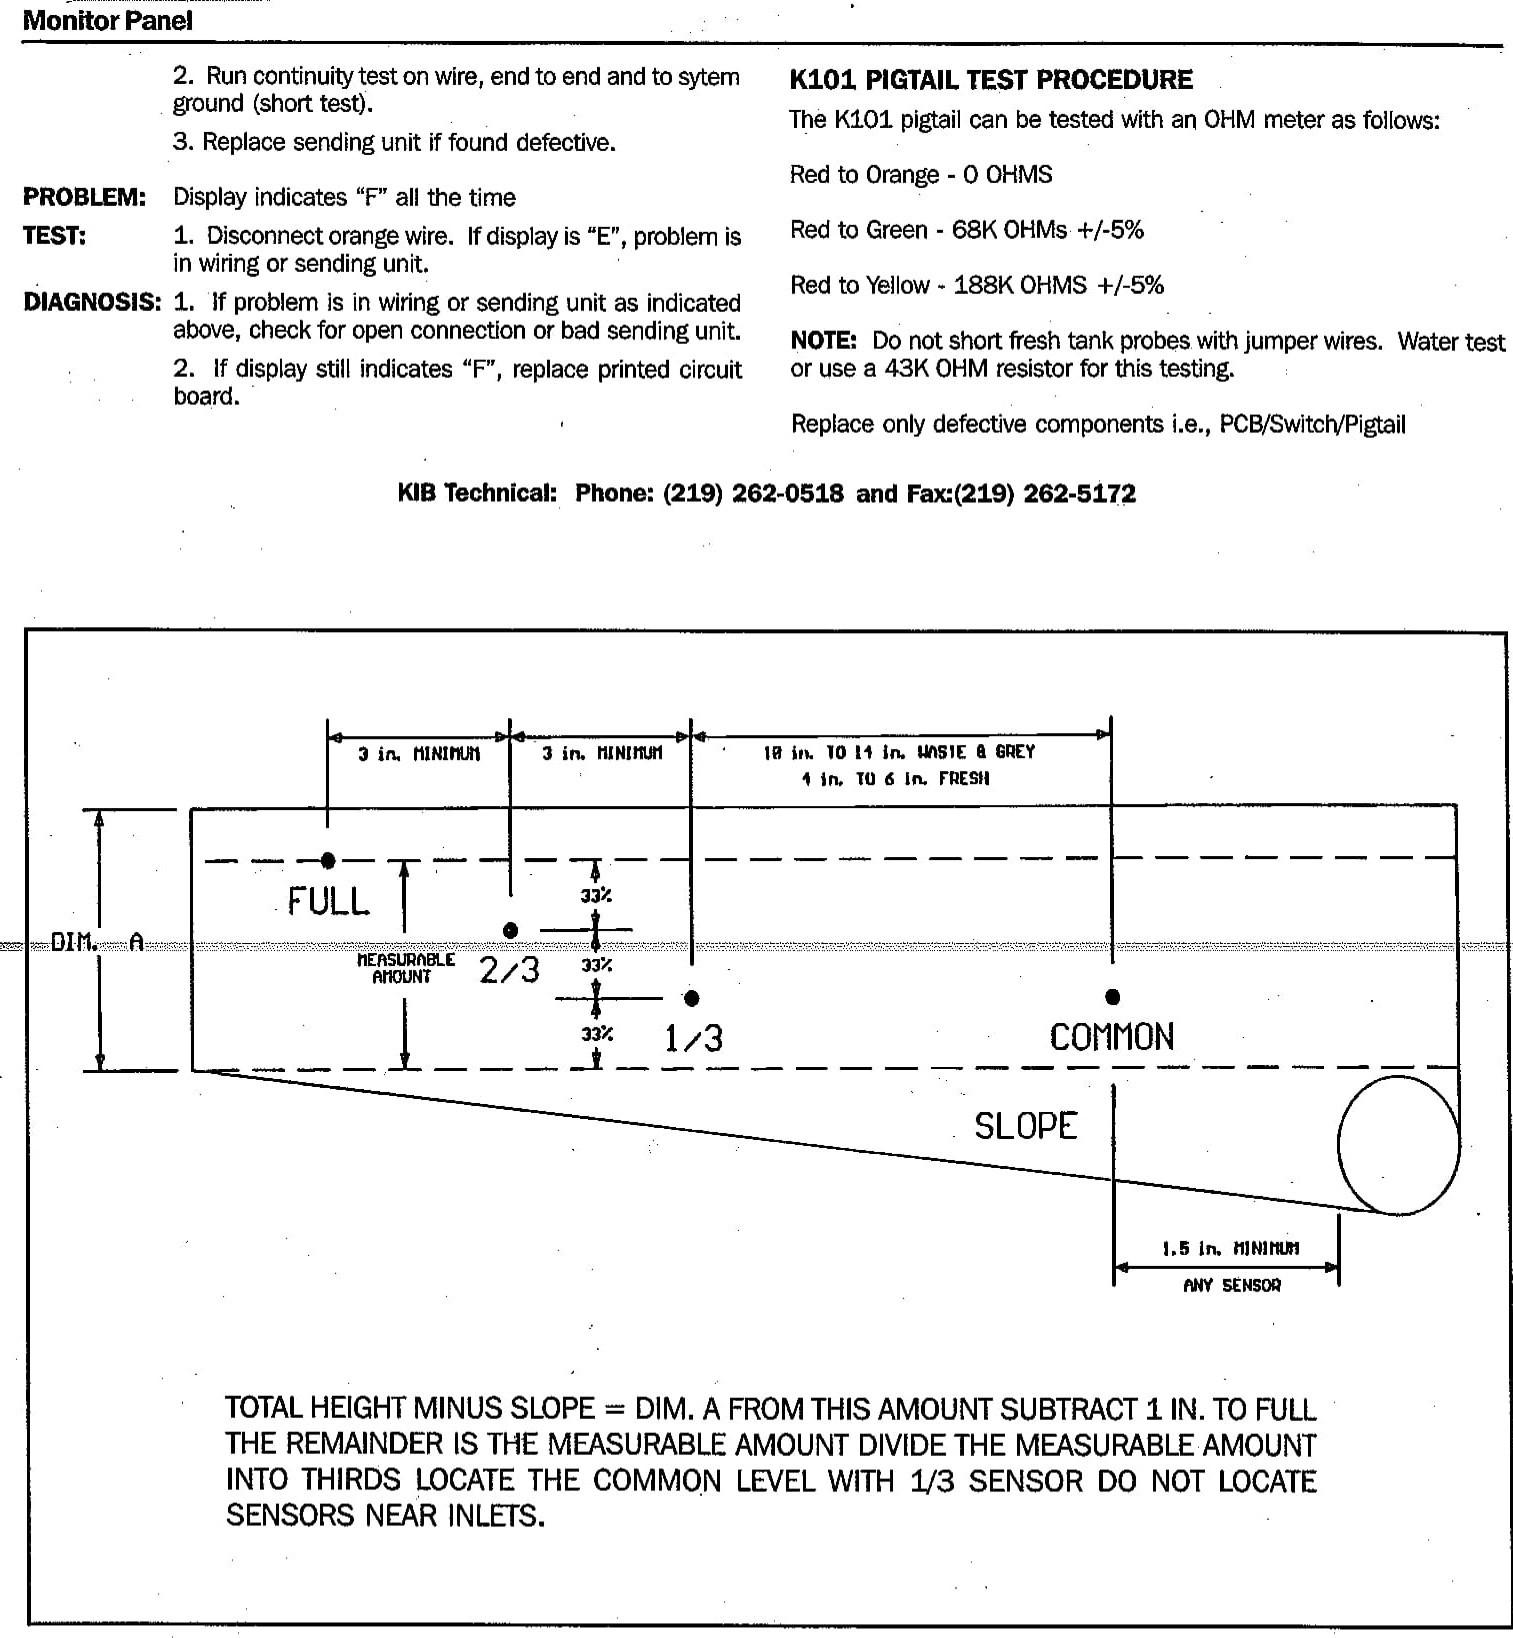 Kib Systems Monitor Panel Schematic Cd79 Kib Monitor Wiring Diagram Of Kib Systems Monitor Panel Schematic